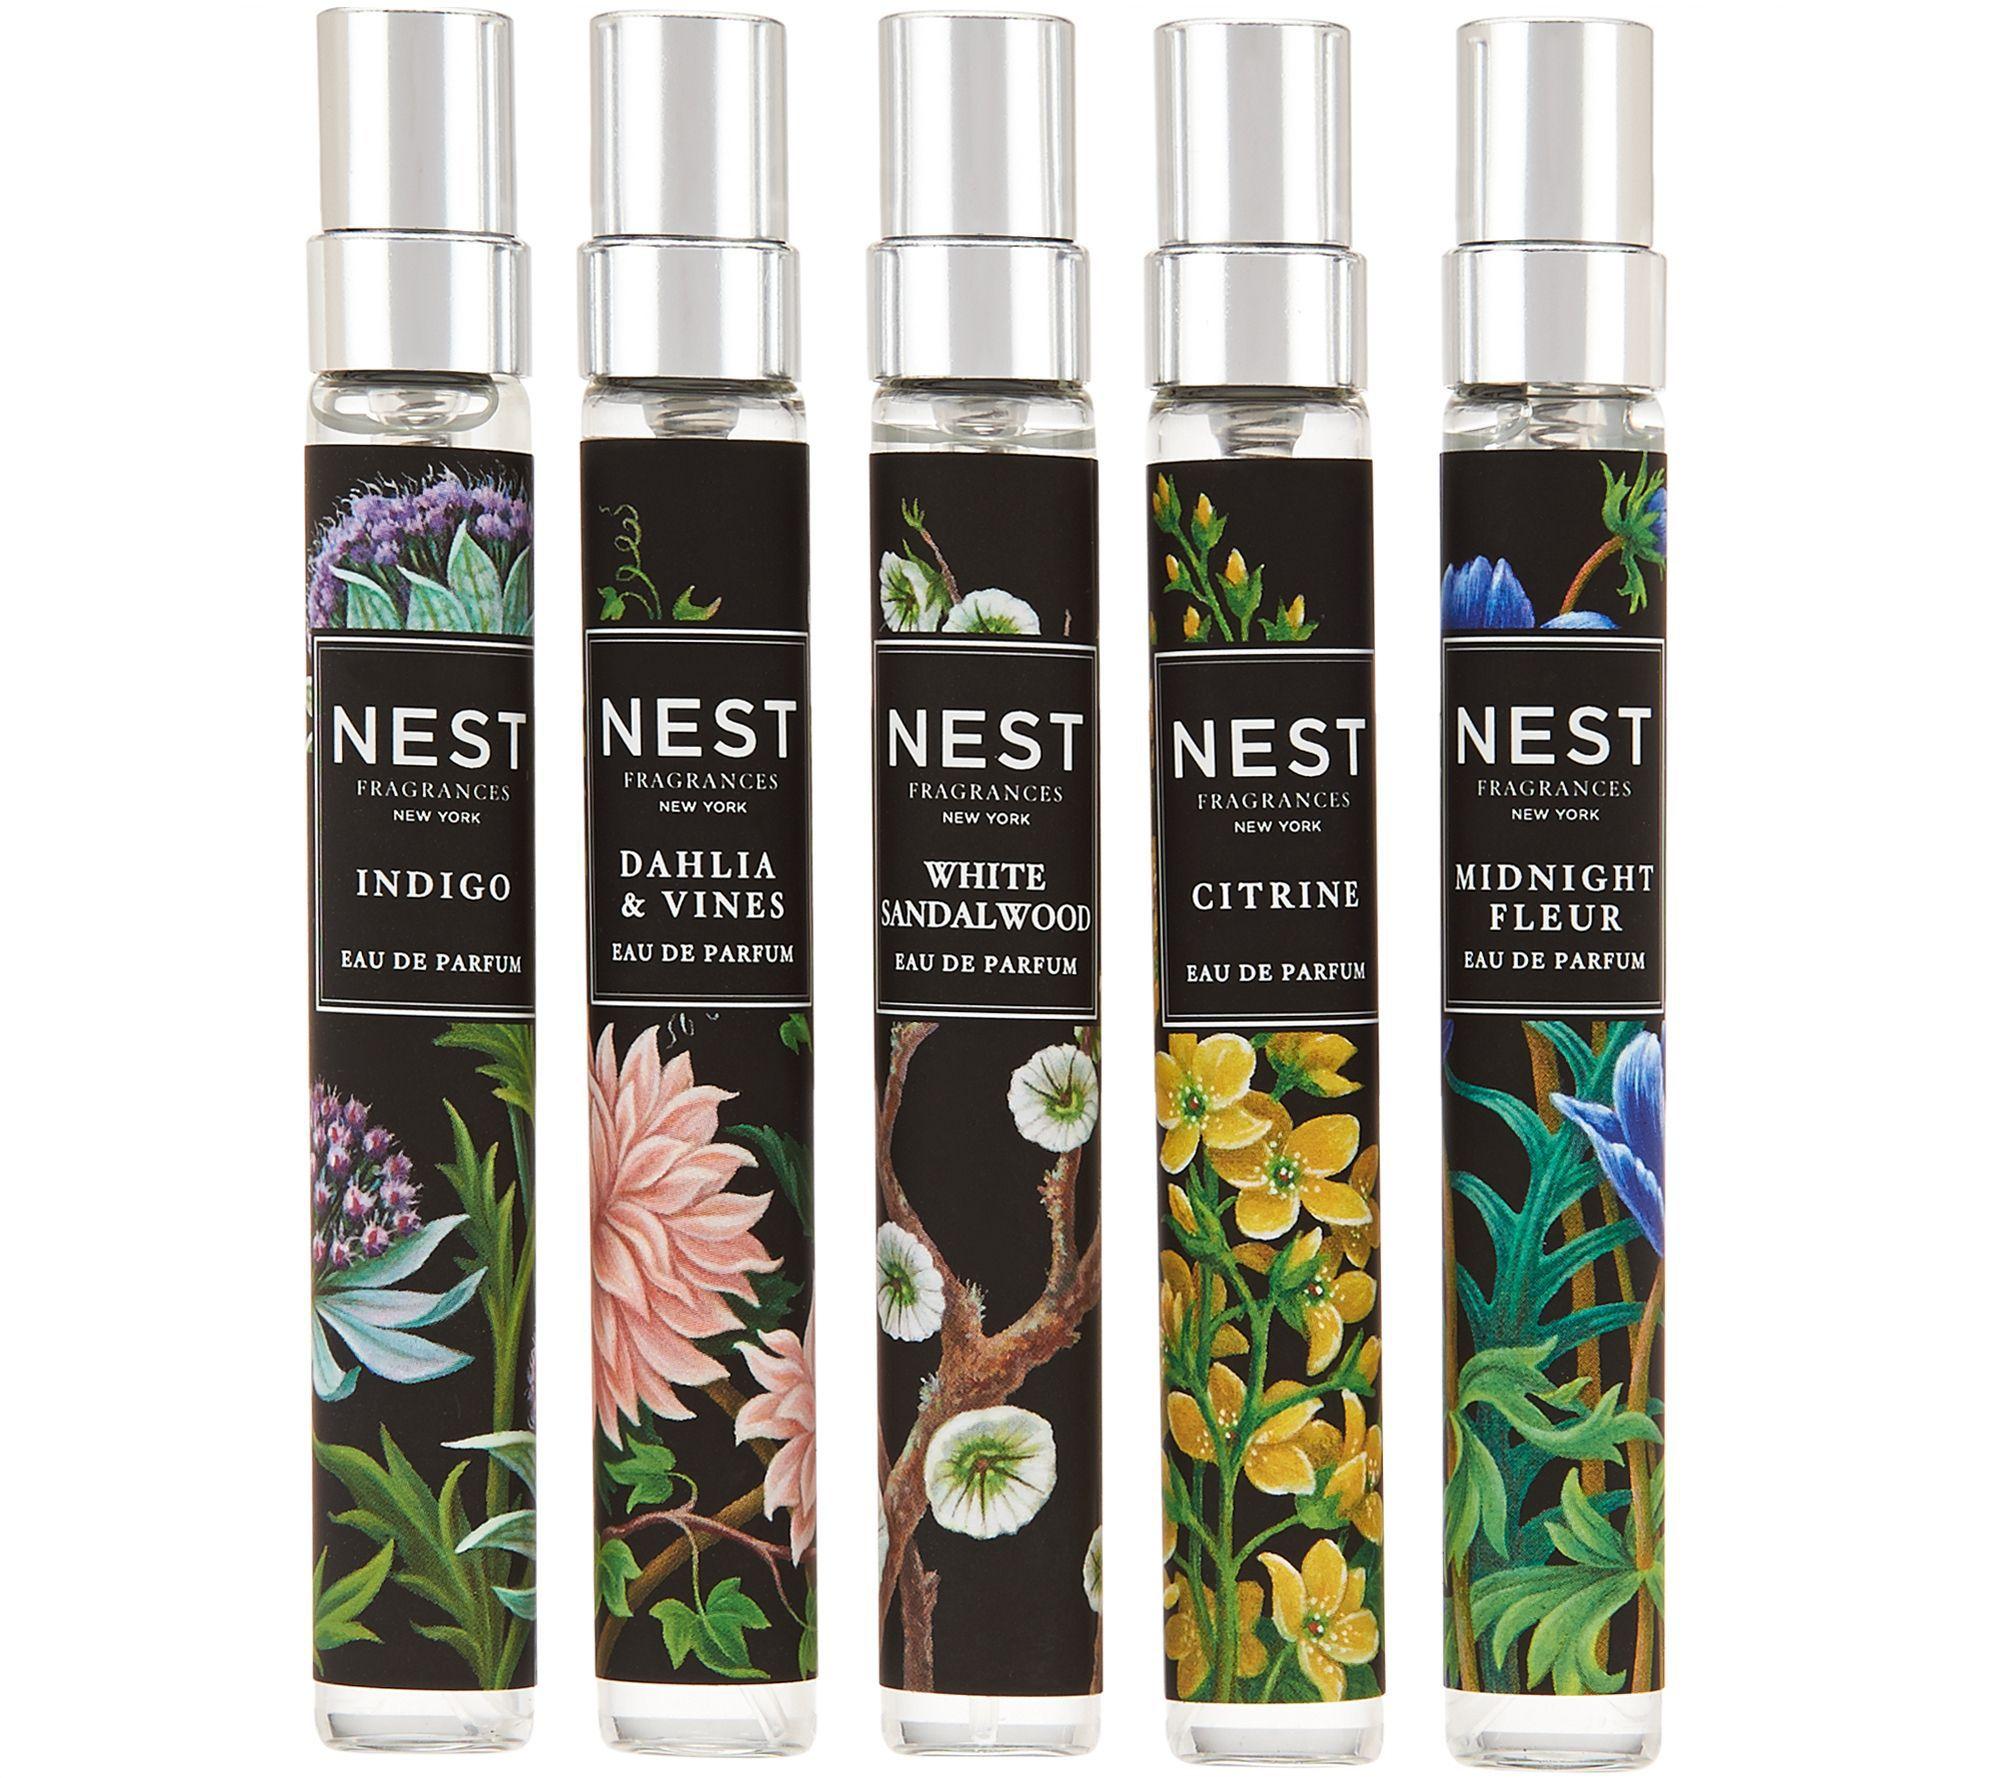 New customer qvc promo code - Nest Fragrances 5 Piece Eau De Parfum Sprays A284009